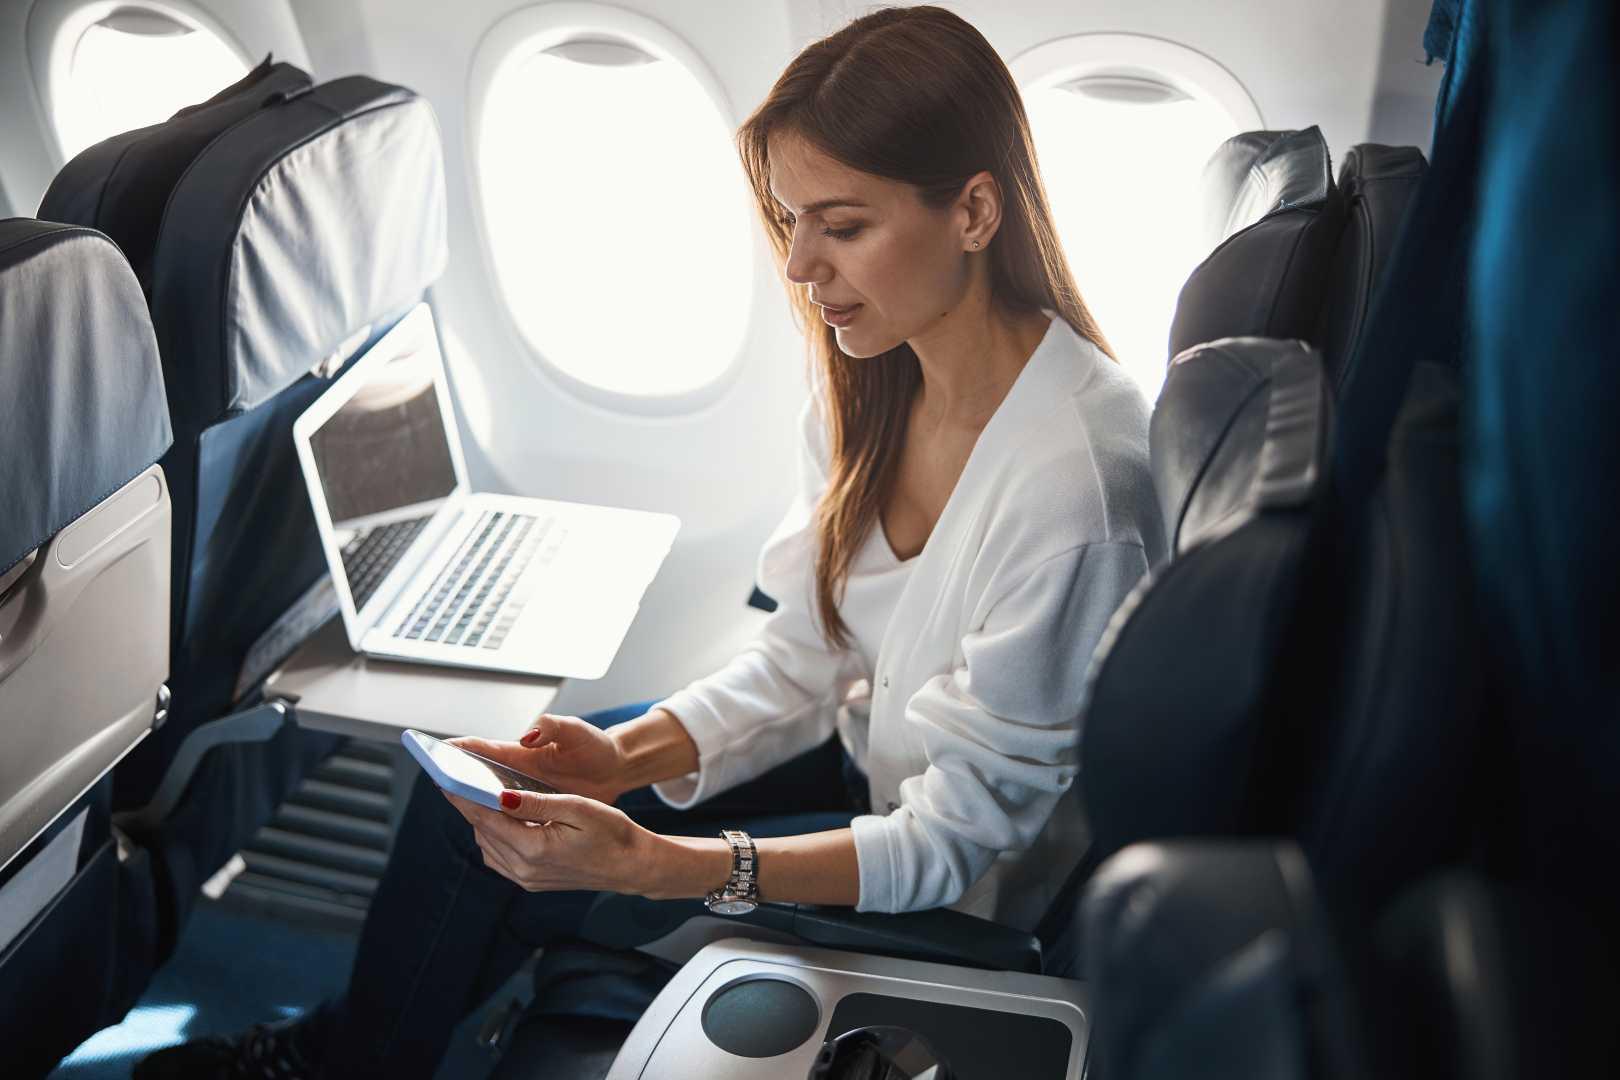 GSm op vliegtuig